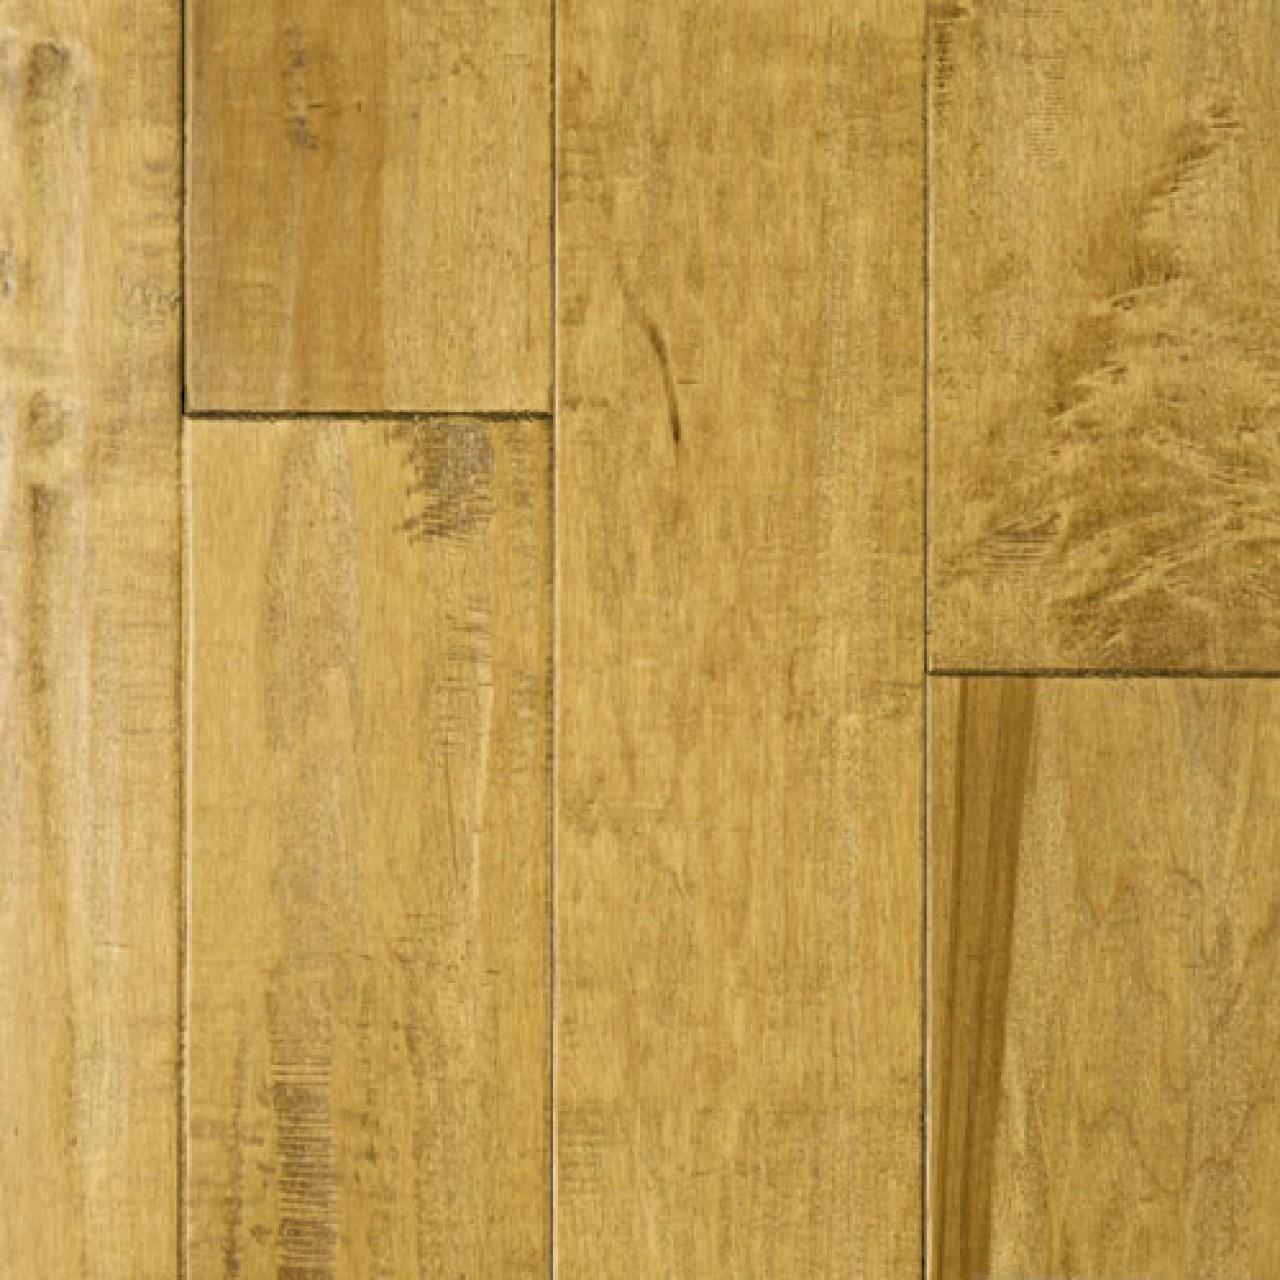 american-maple-handscraped-hardwood.jpg